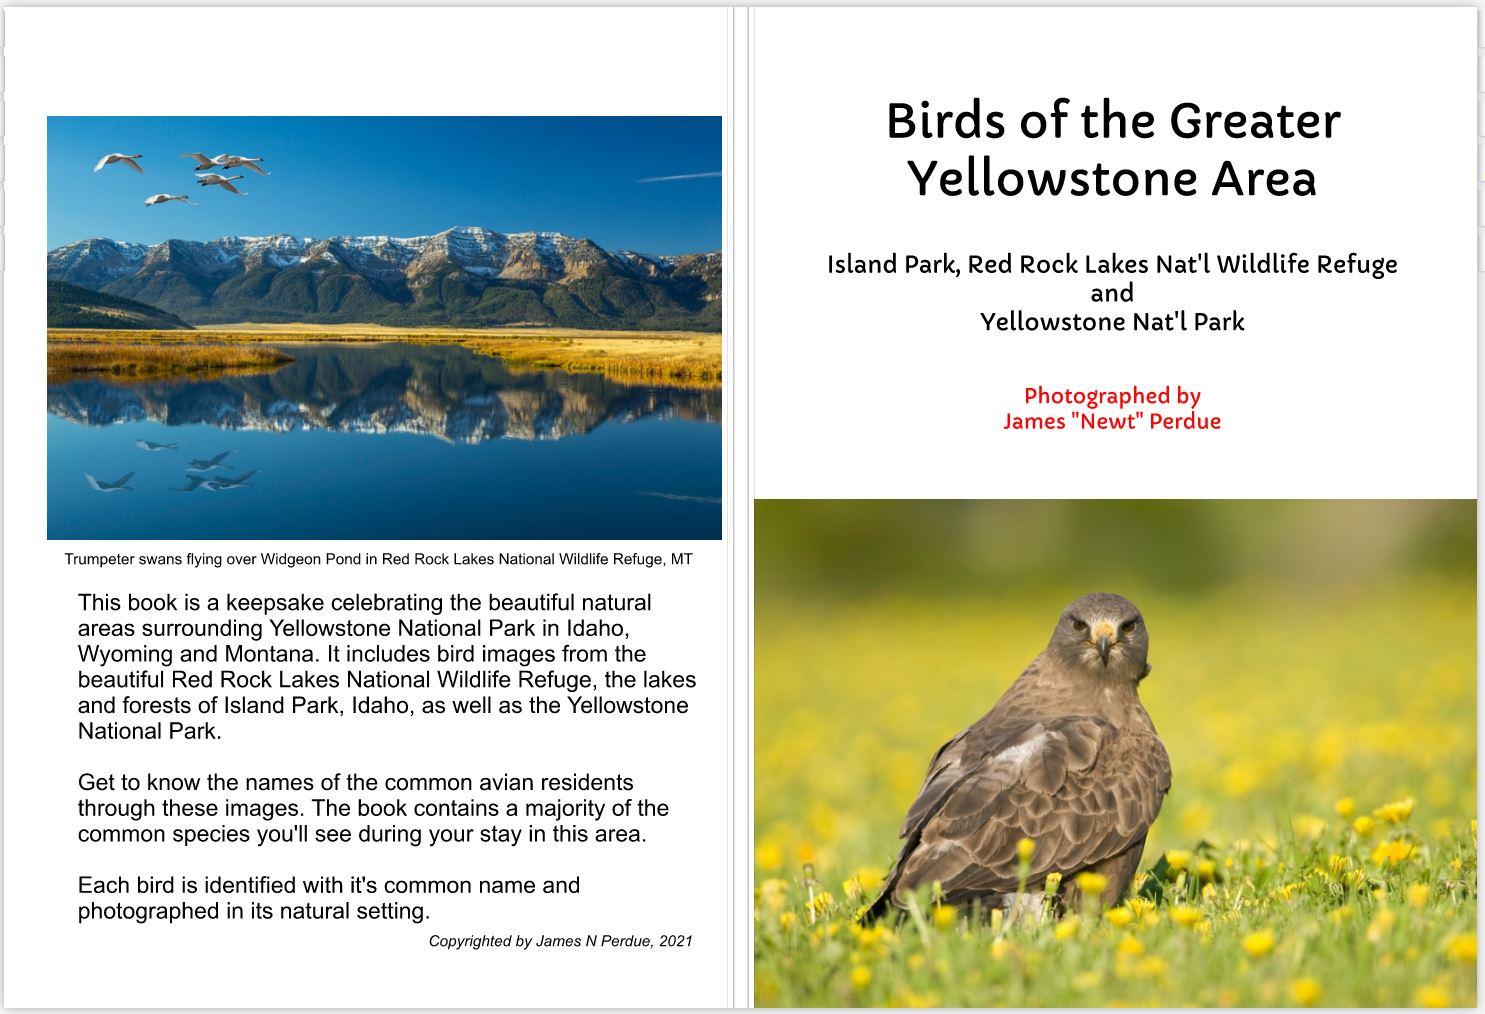 GreaterYellowstoneBirds